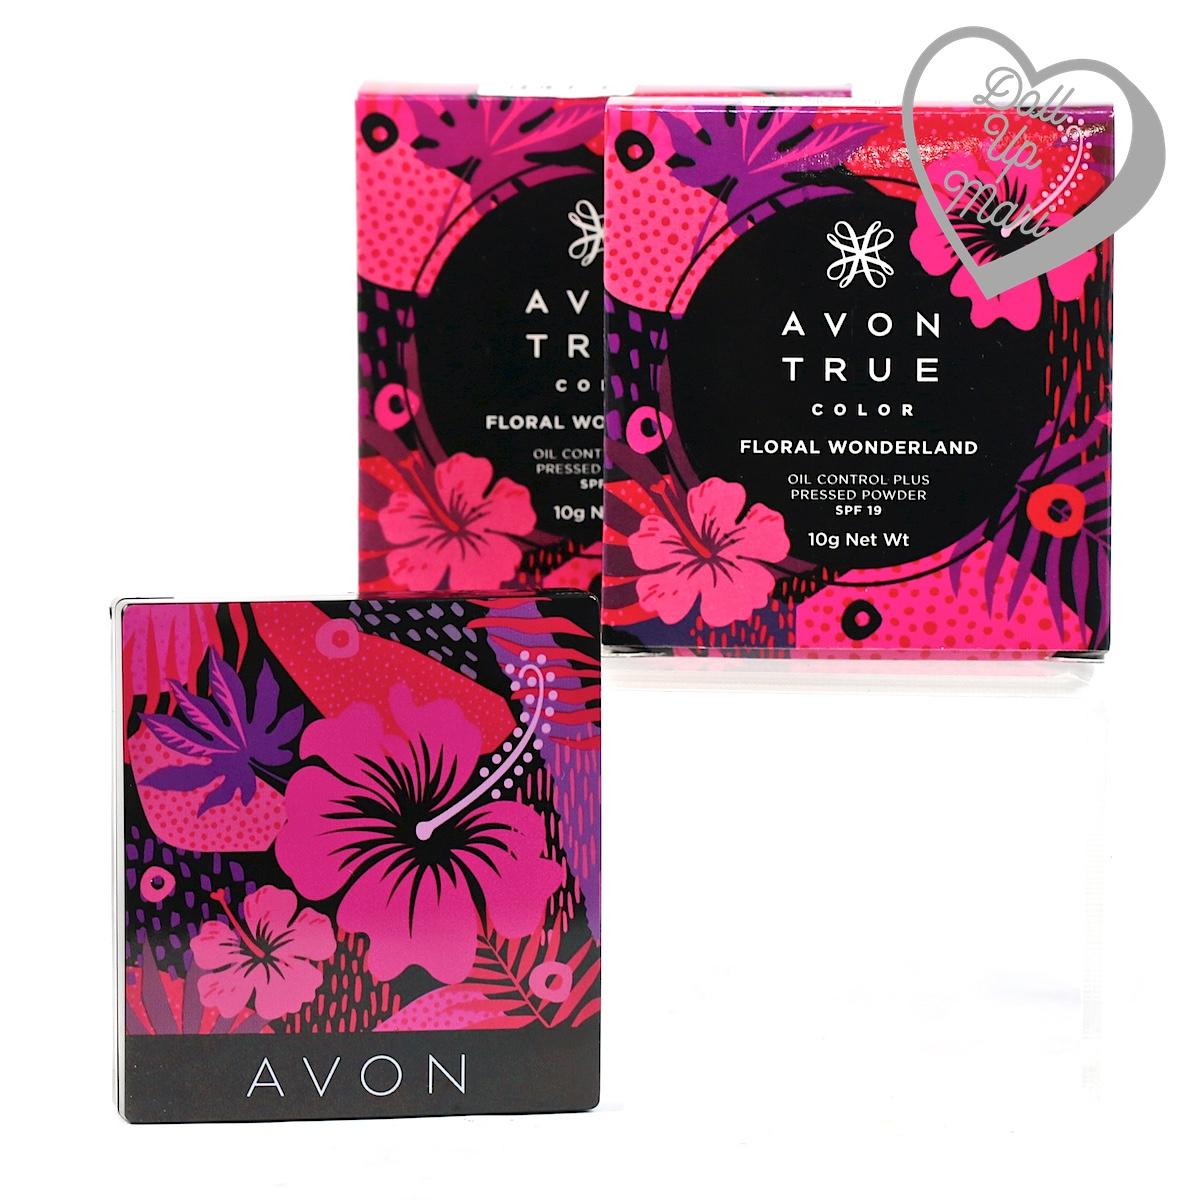 AVON Floral Wonderland Oil Control Plus Pressed Powder Pack Shot